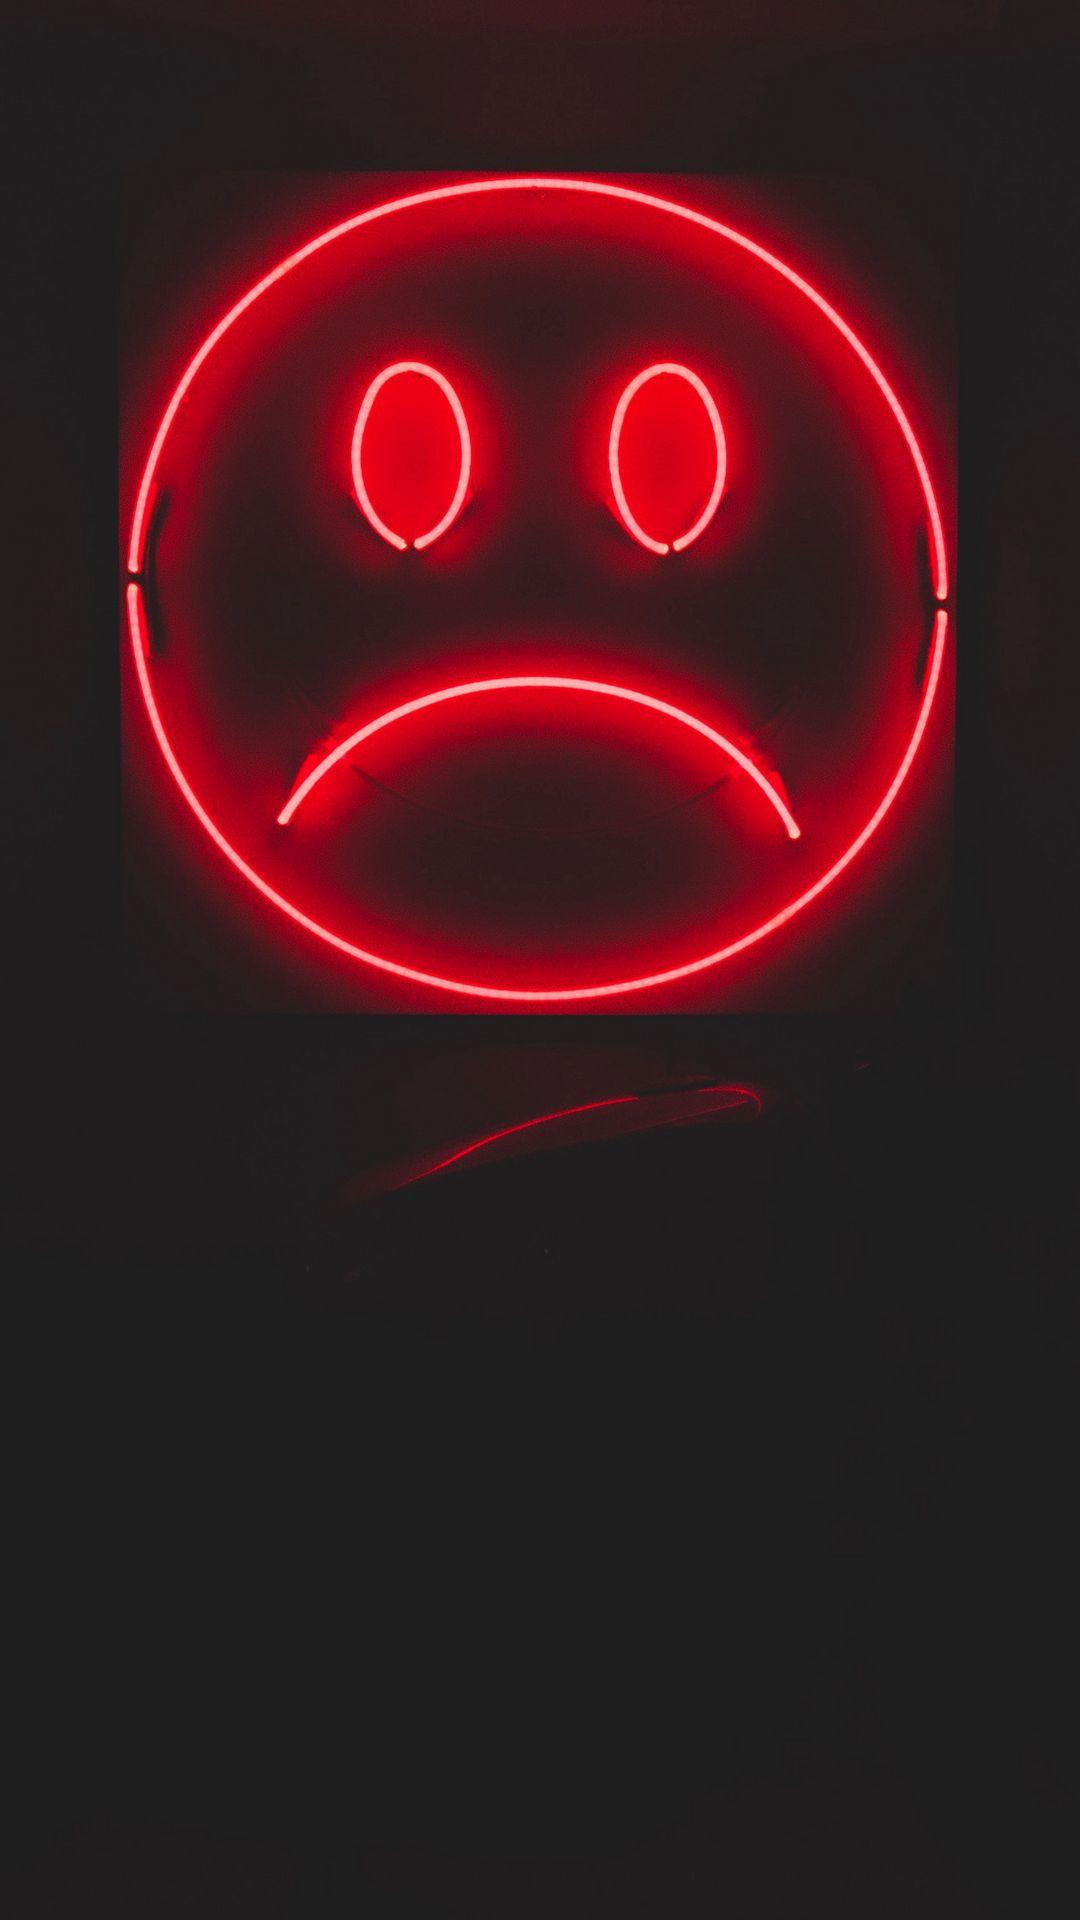 1080x1920 Wallpaper smile, smiley, sad, neon, red, dark